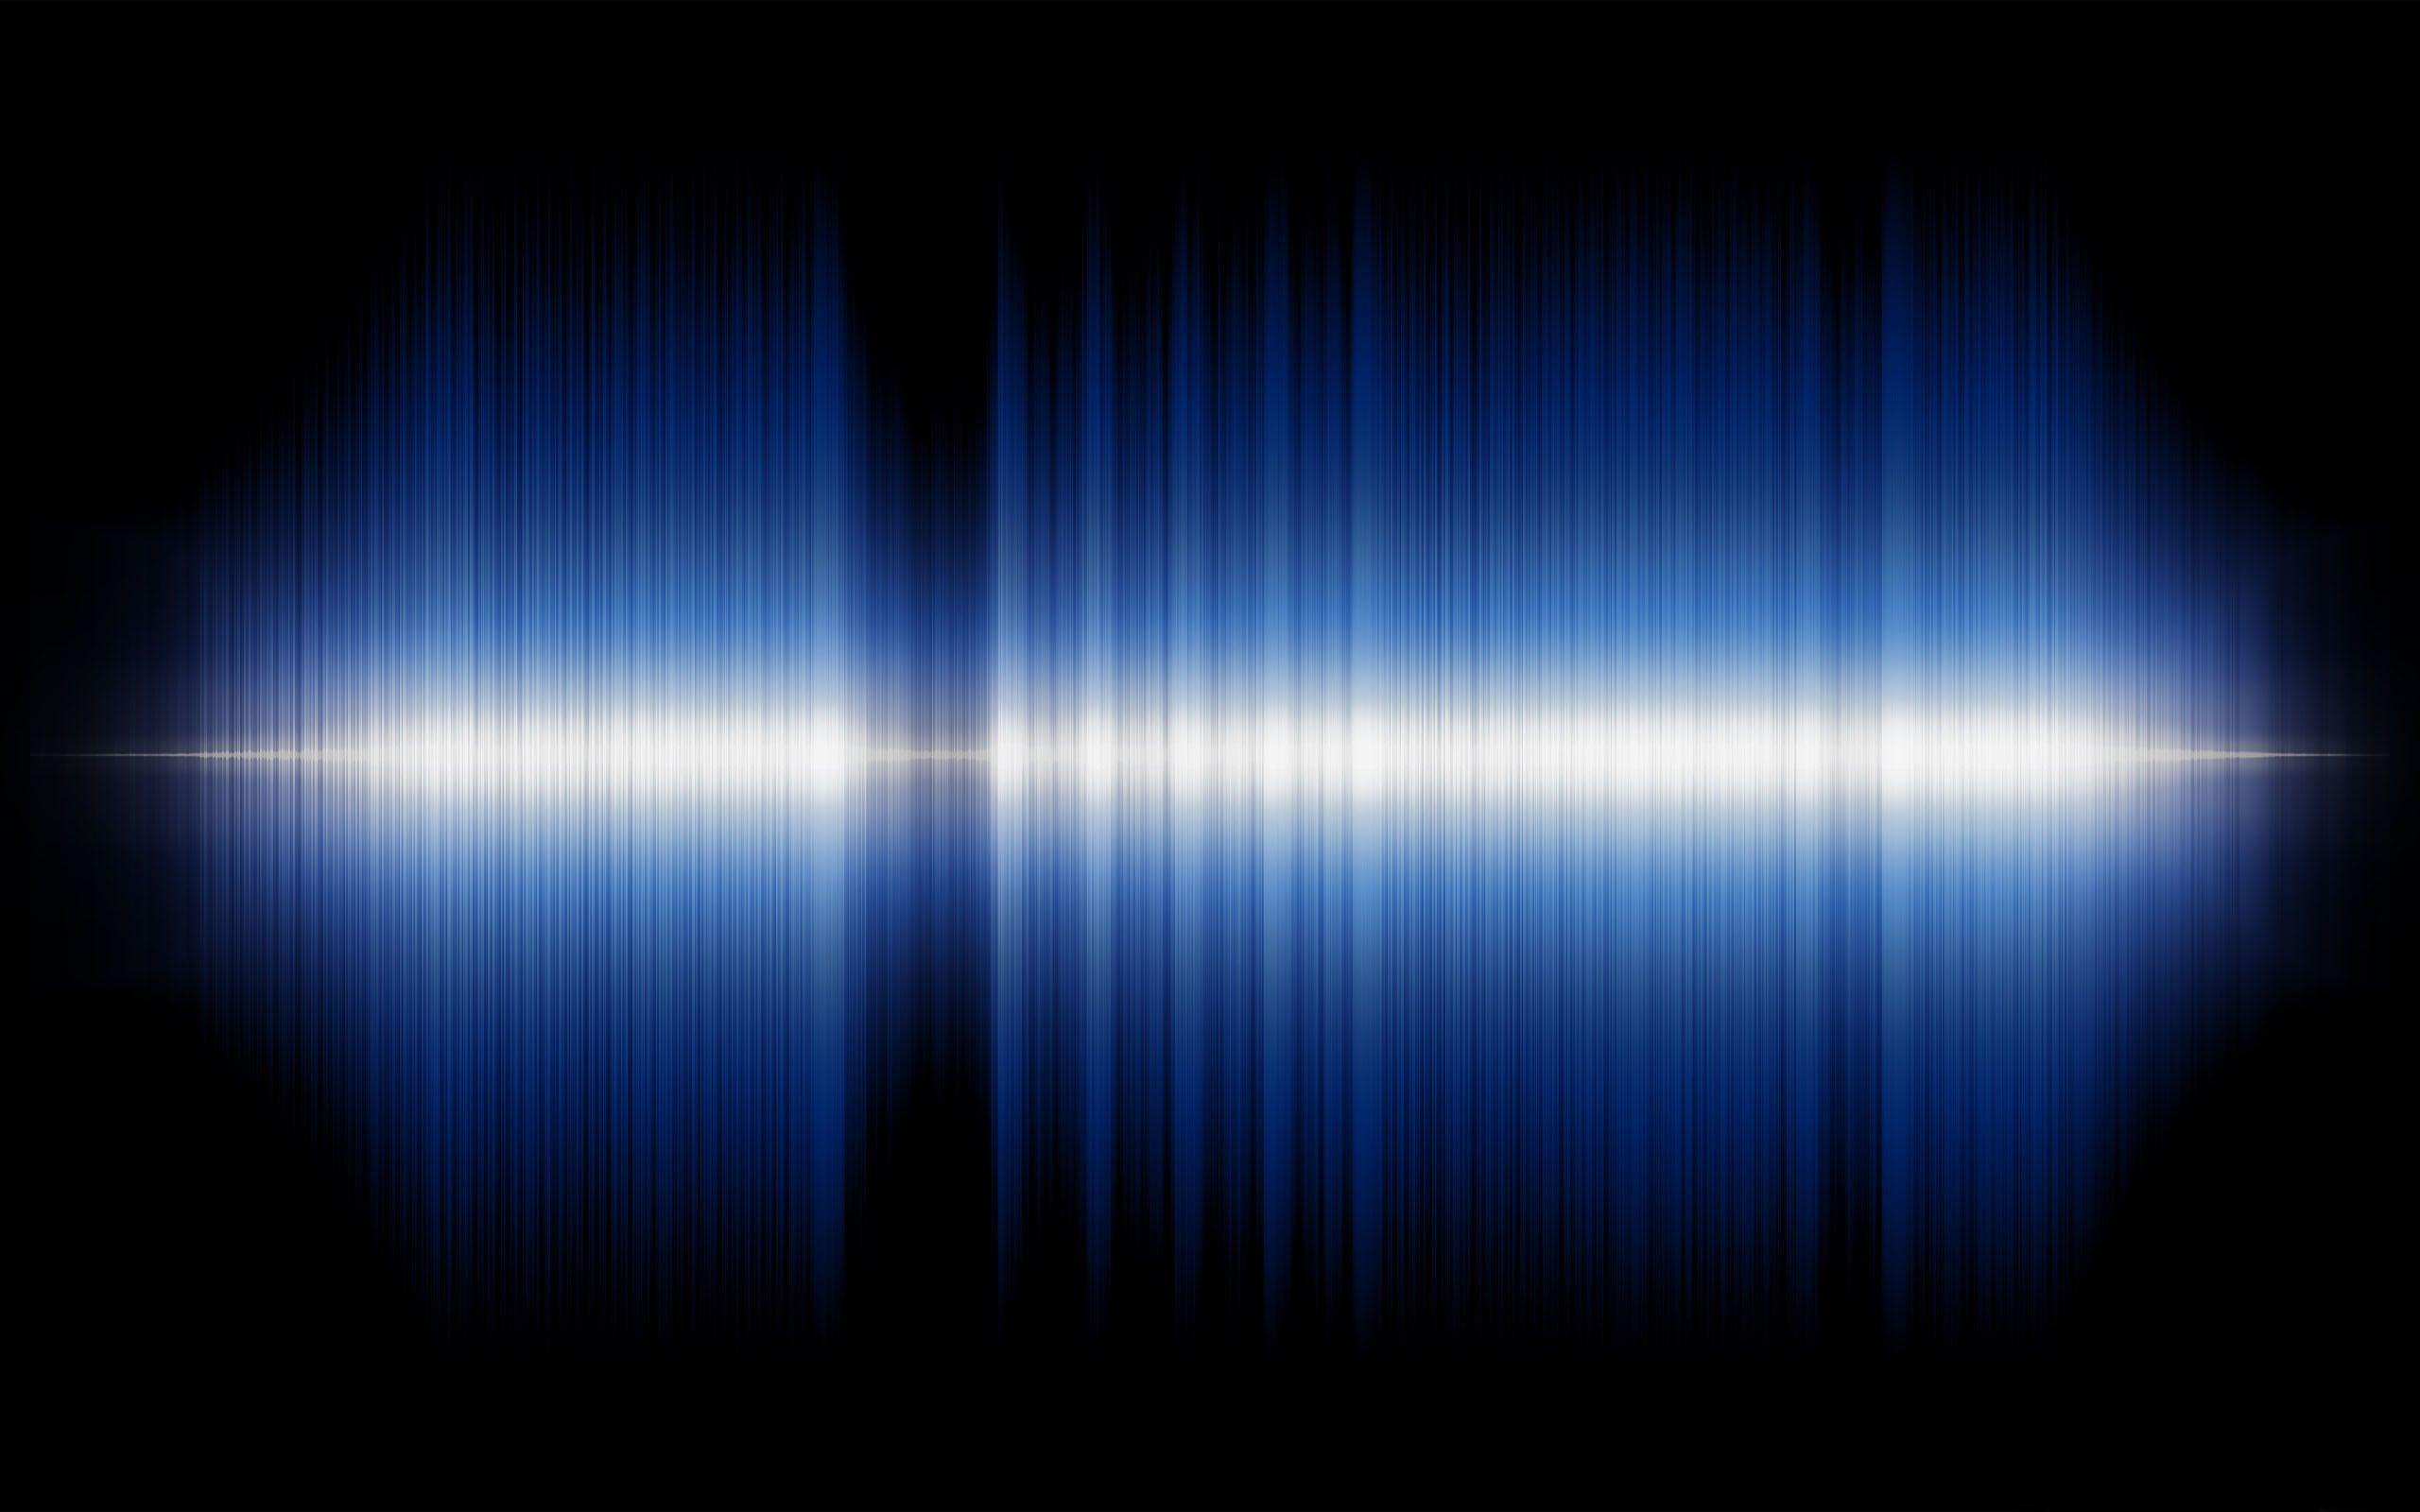 Make Audio Adjustments in Adobe Premiere Pro